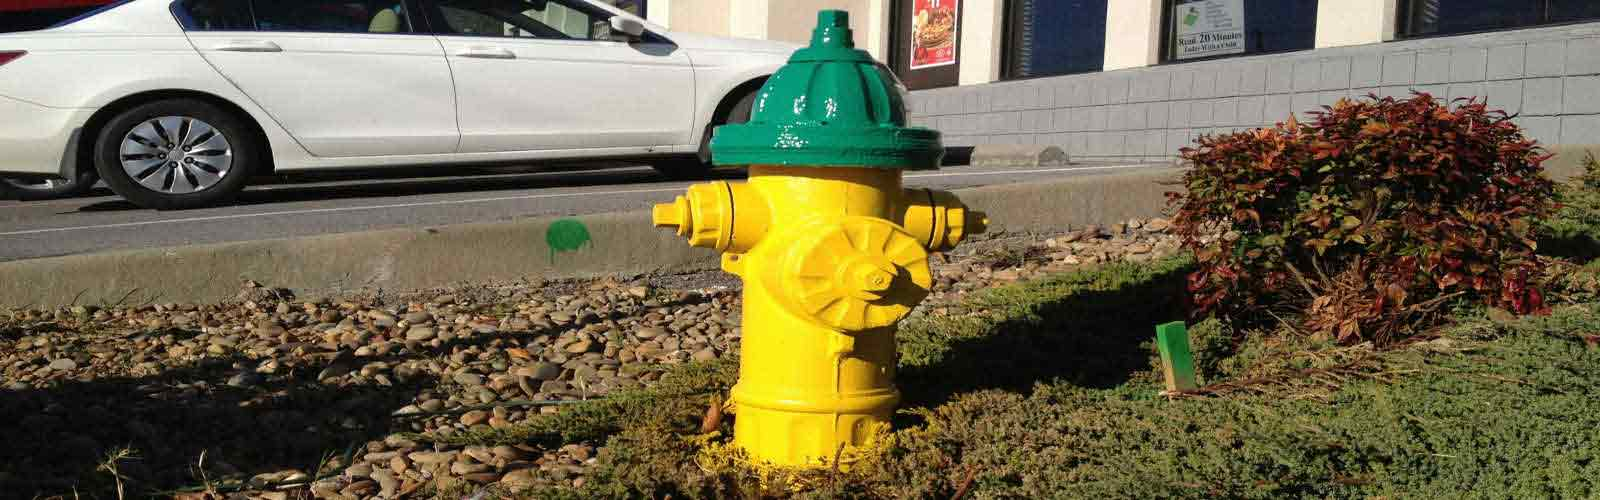 Hydrant-Restoration